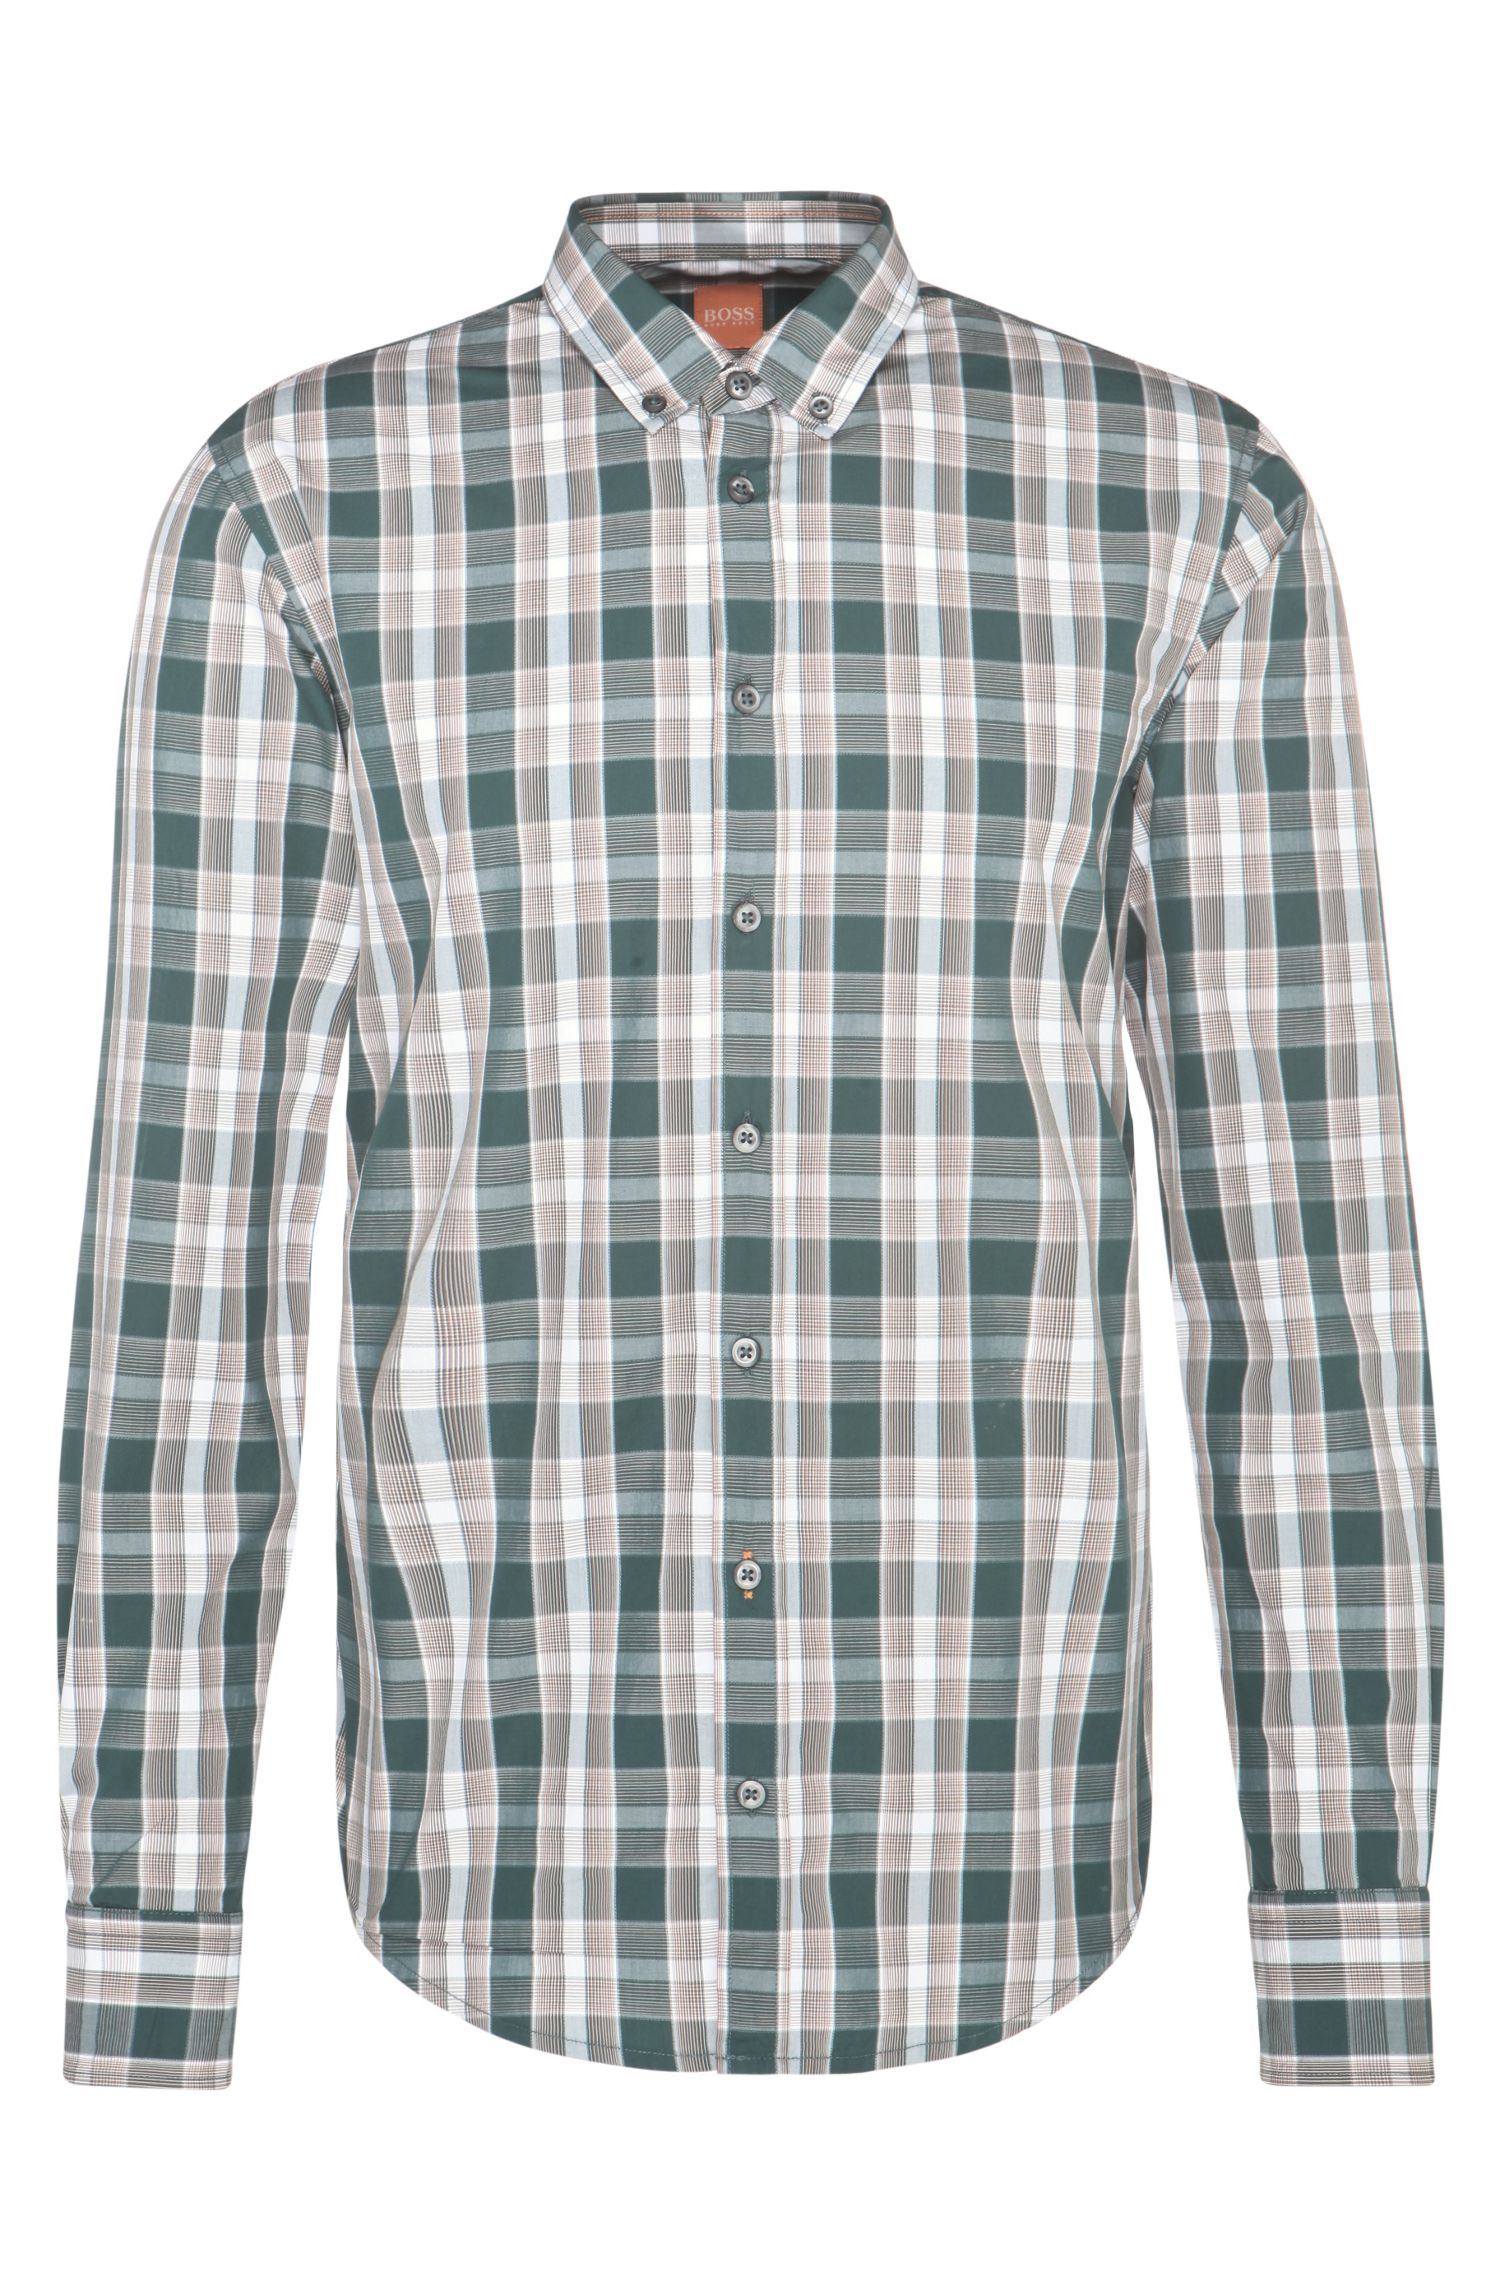 'EdipoE' | Slim Fit, Cotton Printed Button Down Shirt